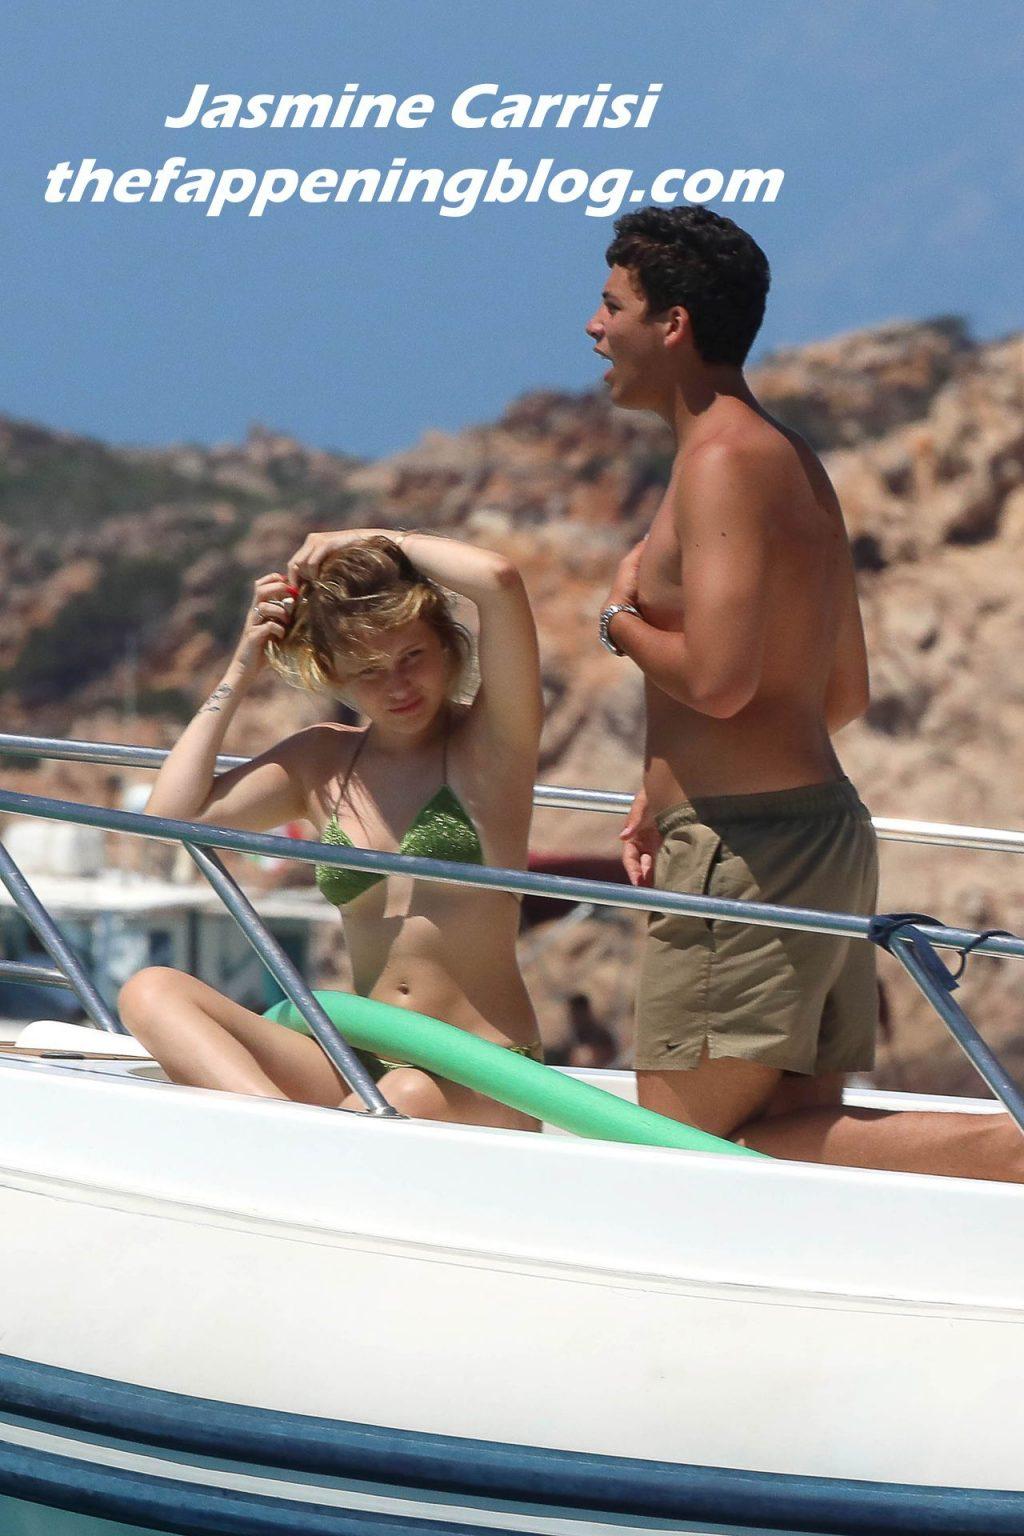 Jasmine Carrisi Enjoys Holidays with Her Friends in Sardinia (16 Photos)